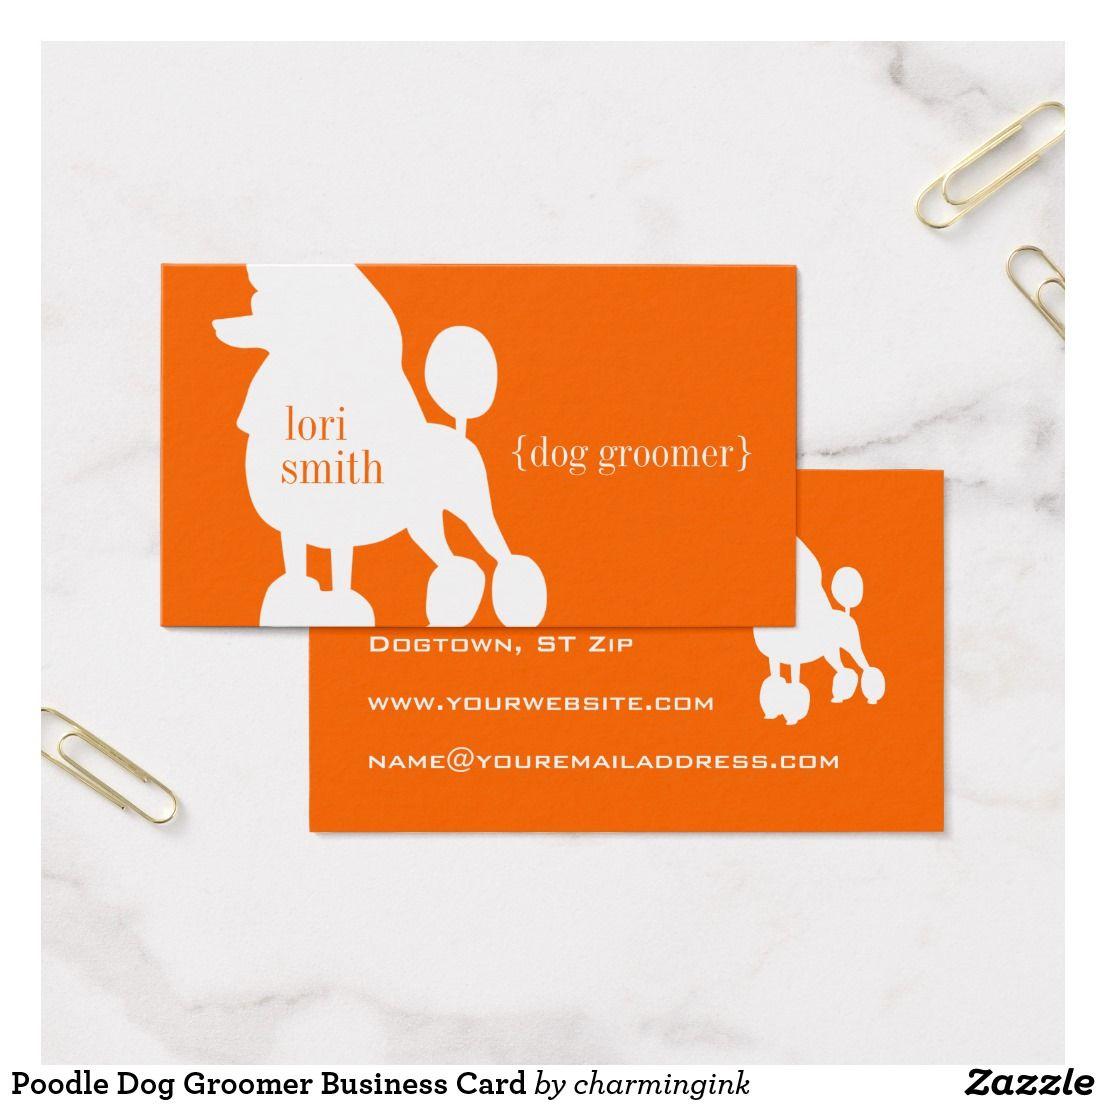 Poodle Dog Groomer Business Card | Business | Pinterest | Dogs ...